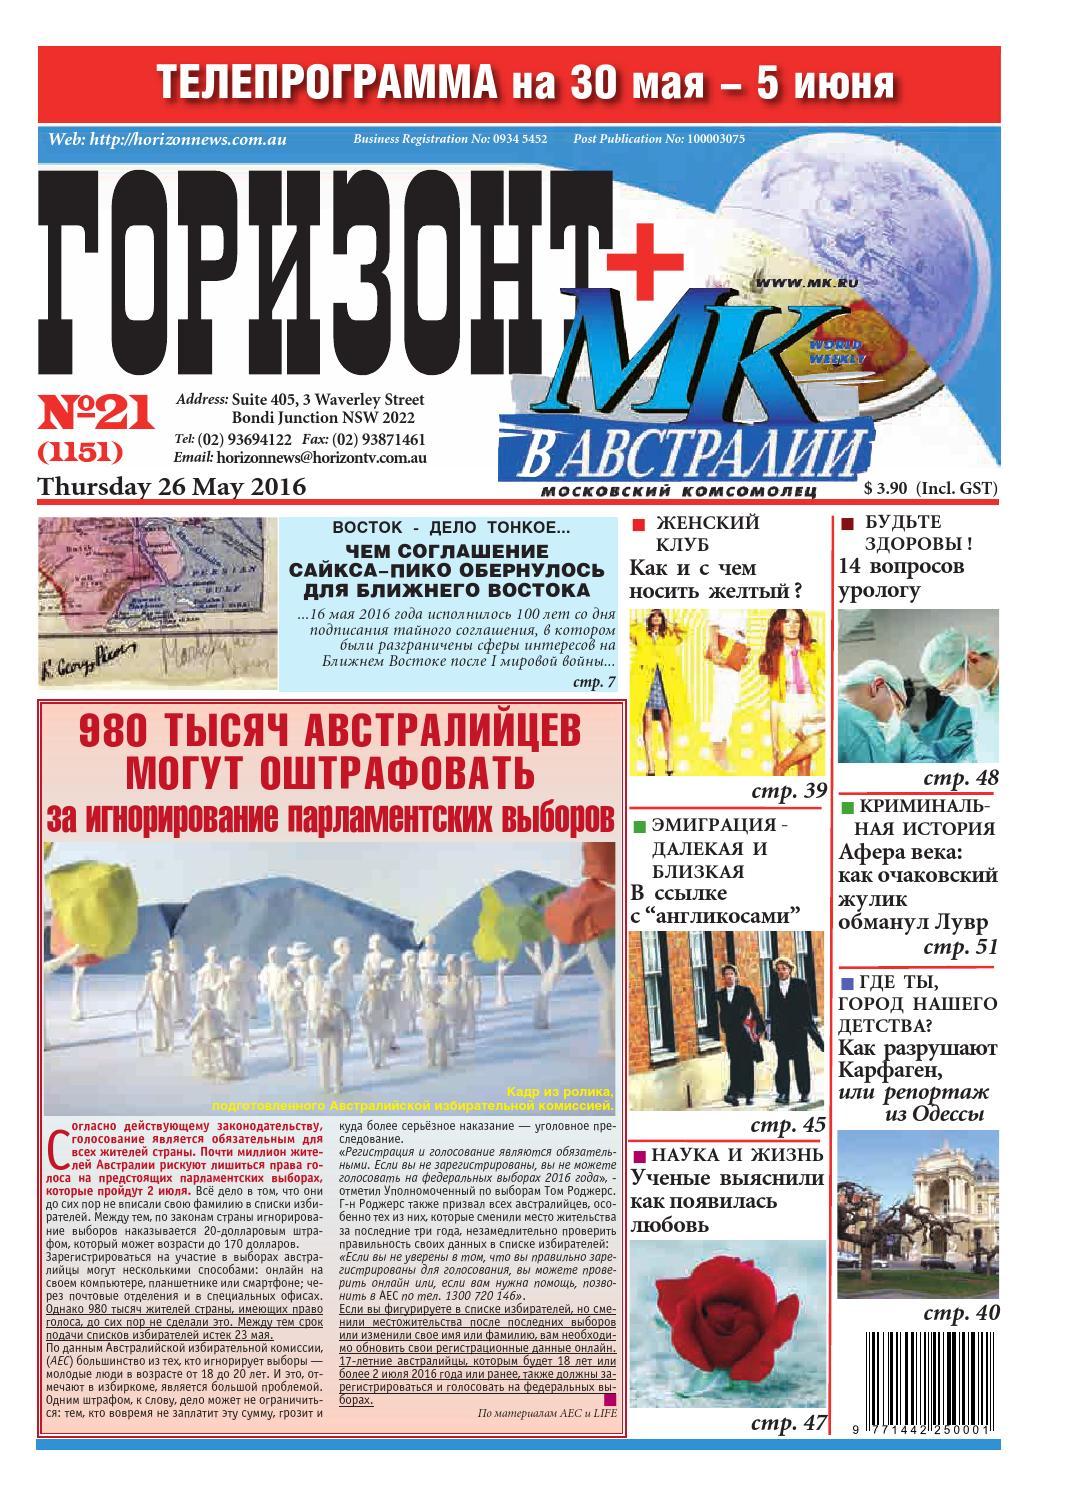 Бошки онлайн Волгодонск Прегабалин price Невинномысск